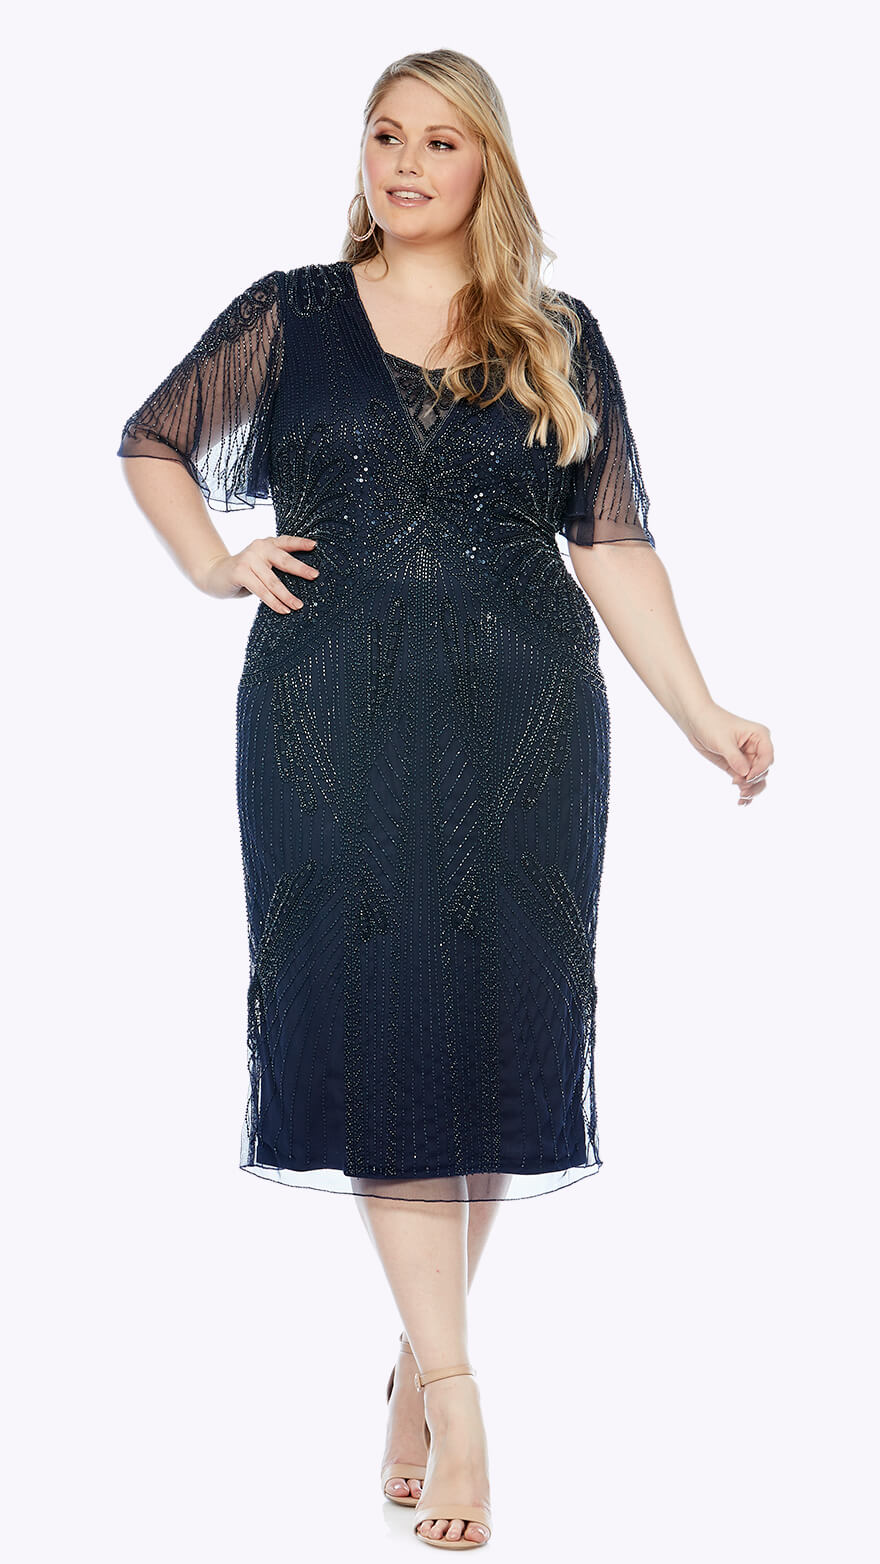 LJ0360 Knee-length beaded gown with soft flowy chiffon sleeve